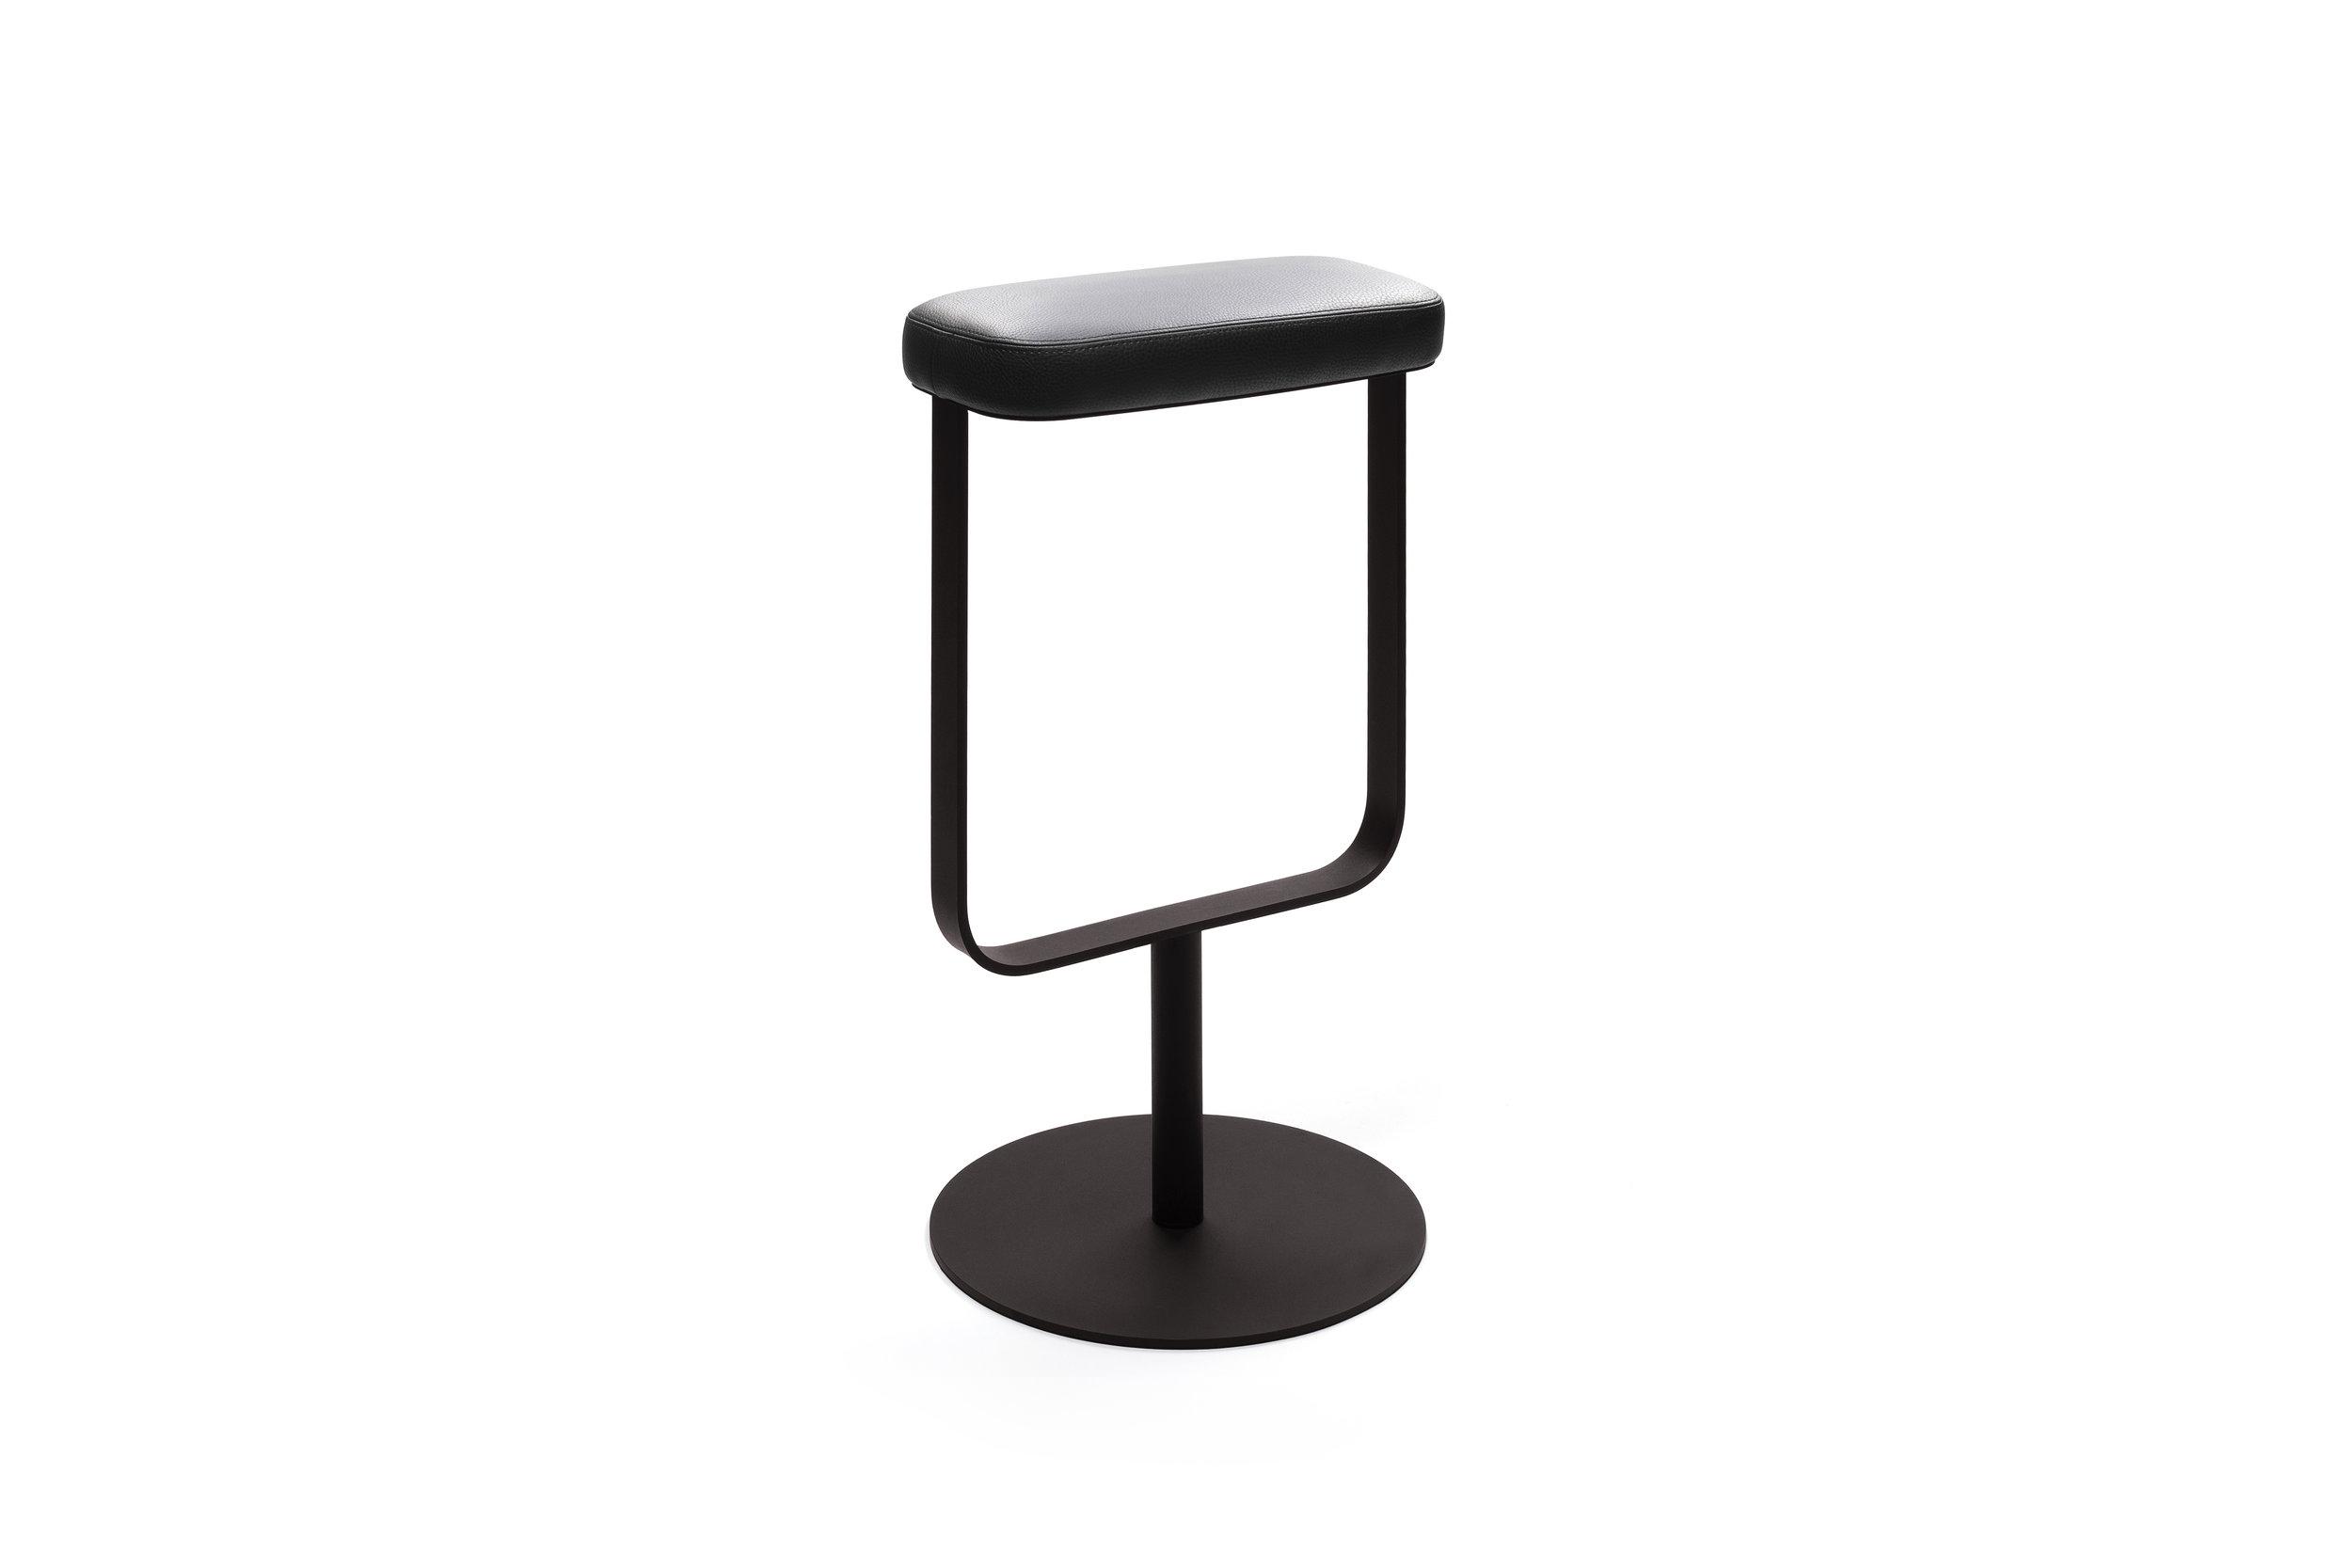 OBJEKTEN_Slim_Bar stool_AlainBerteau_3.jpg